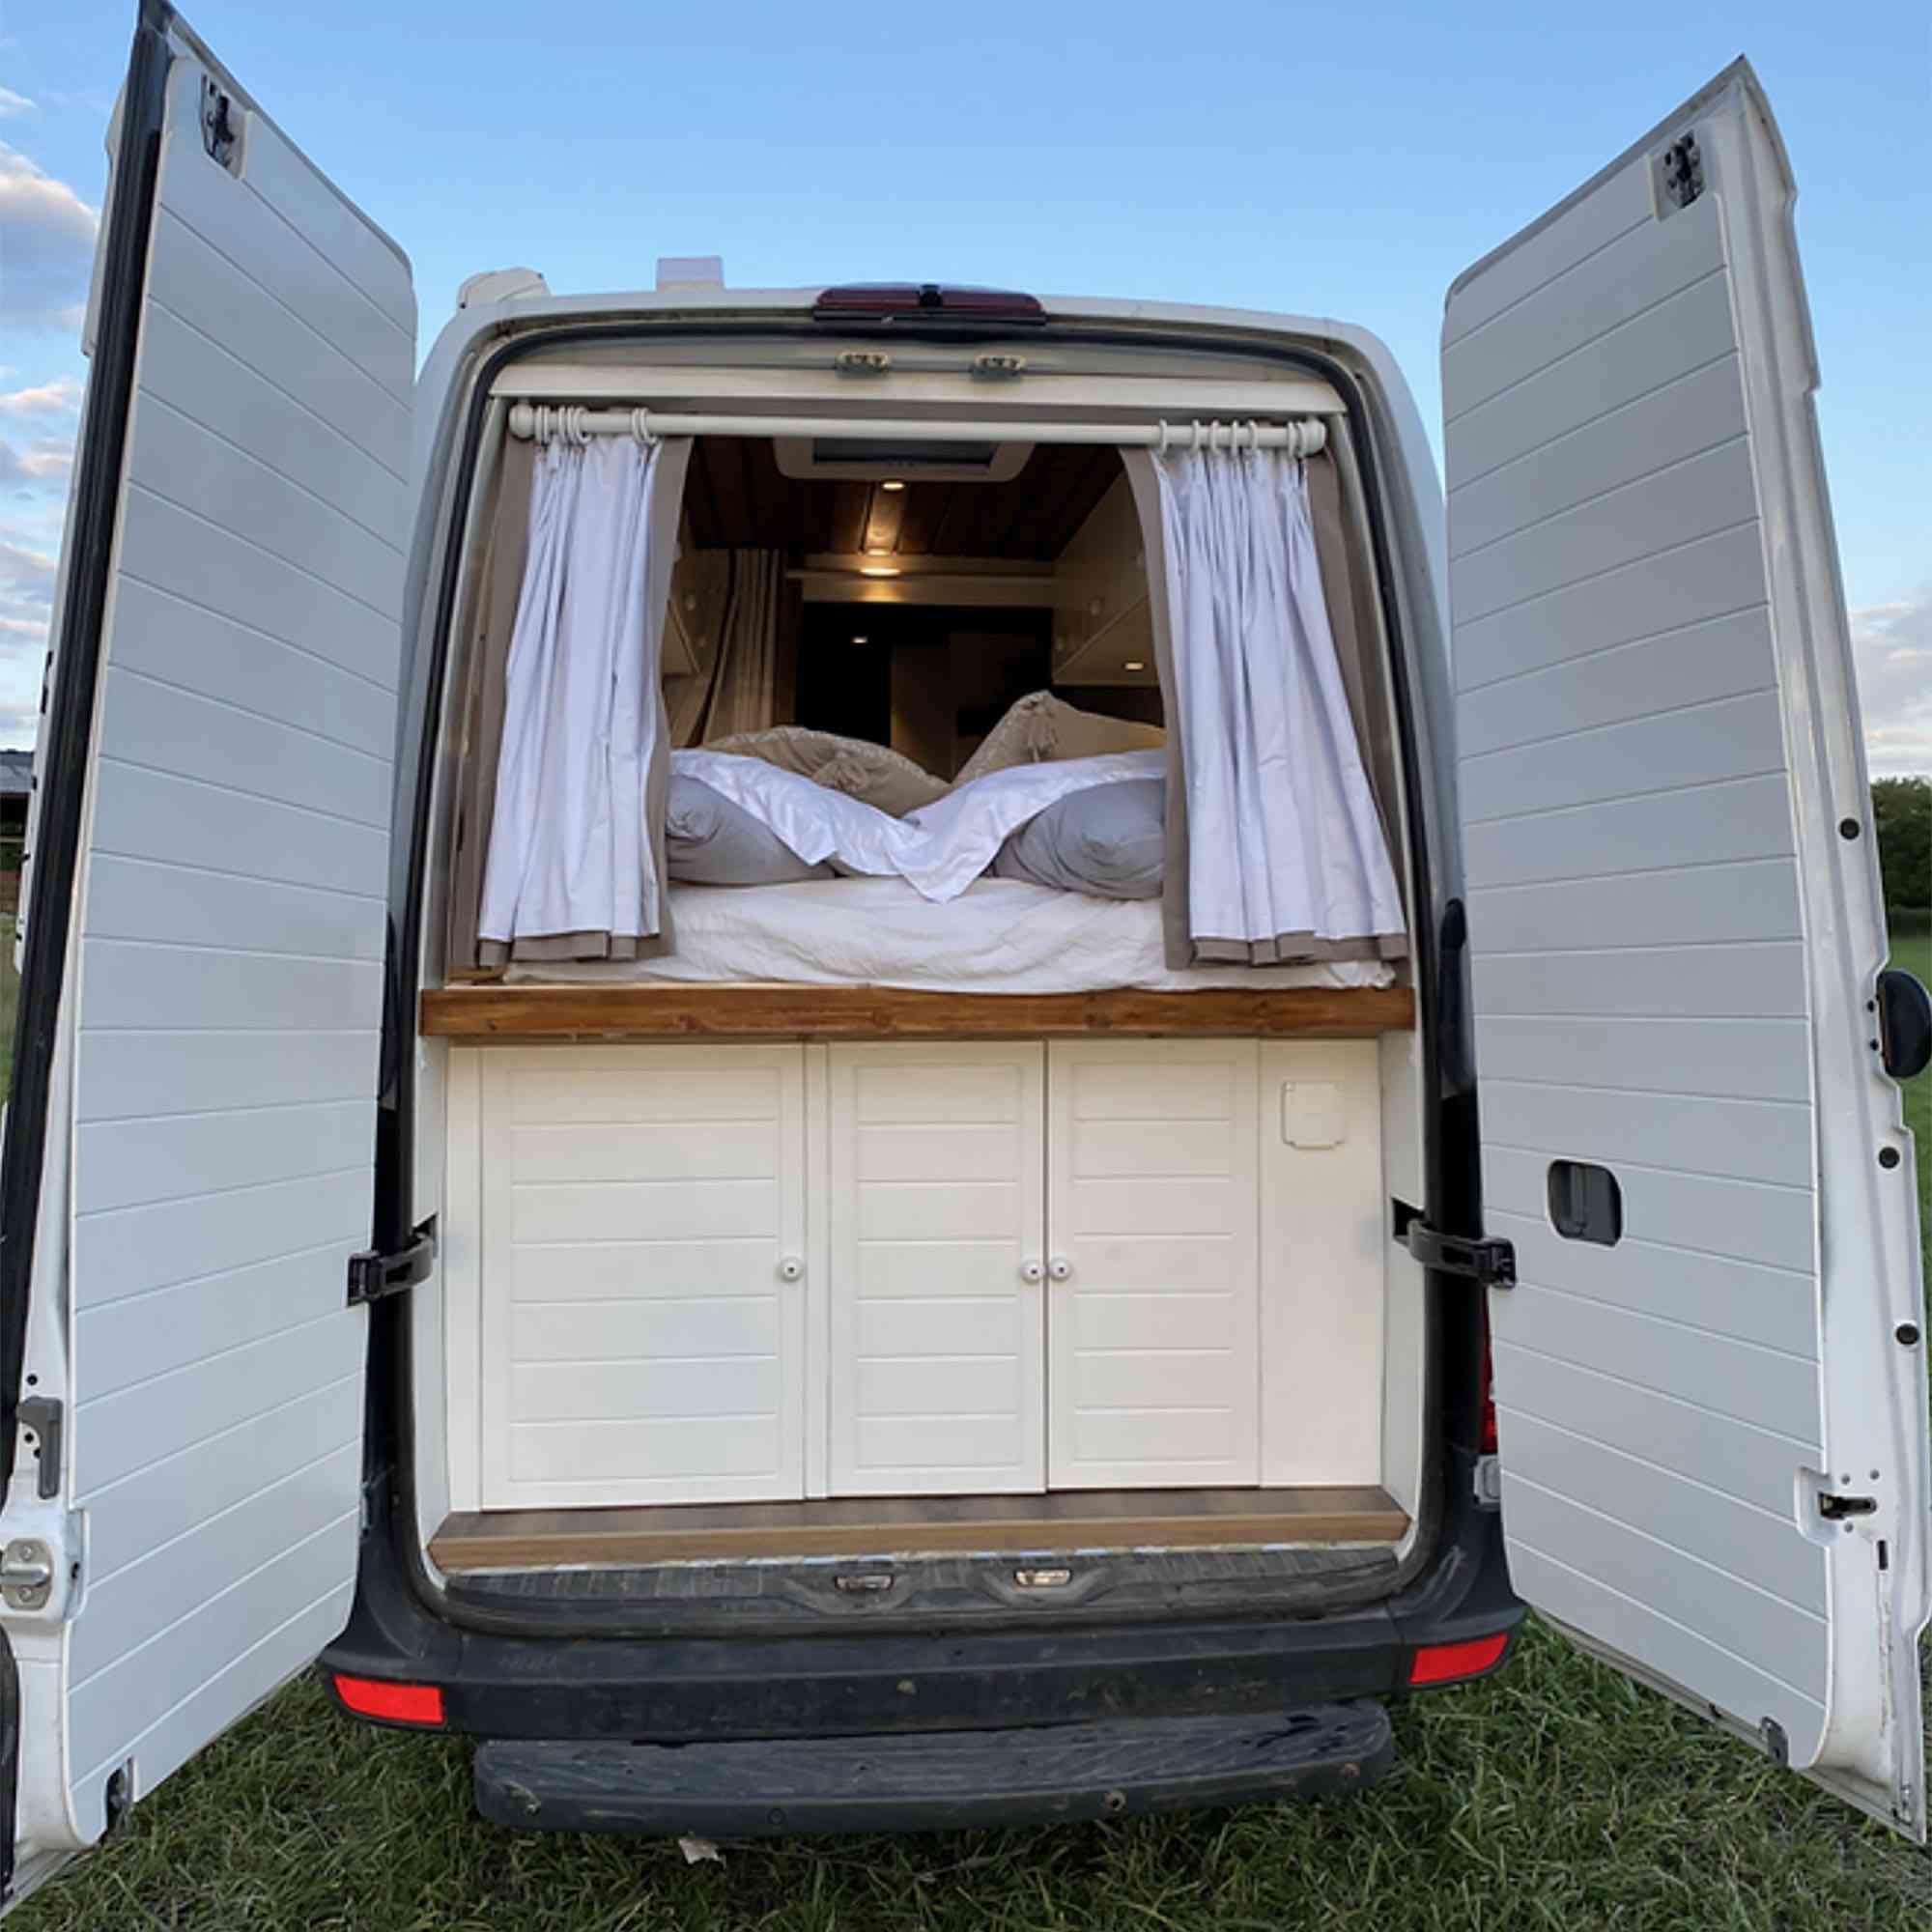 Stacia van conversion Vanlife Conversions Ltd. rear storage garage